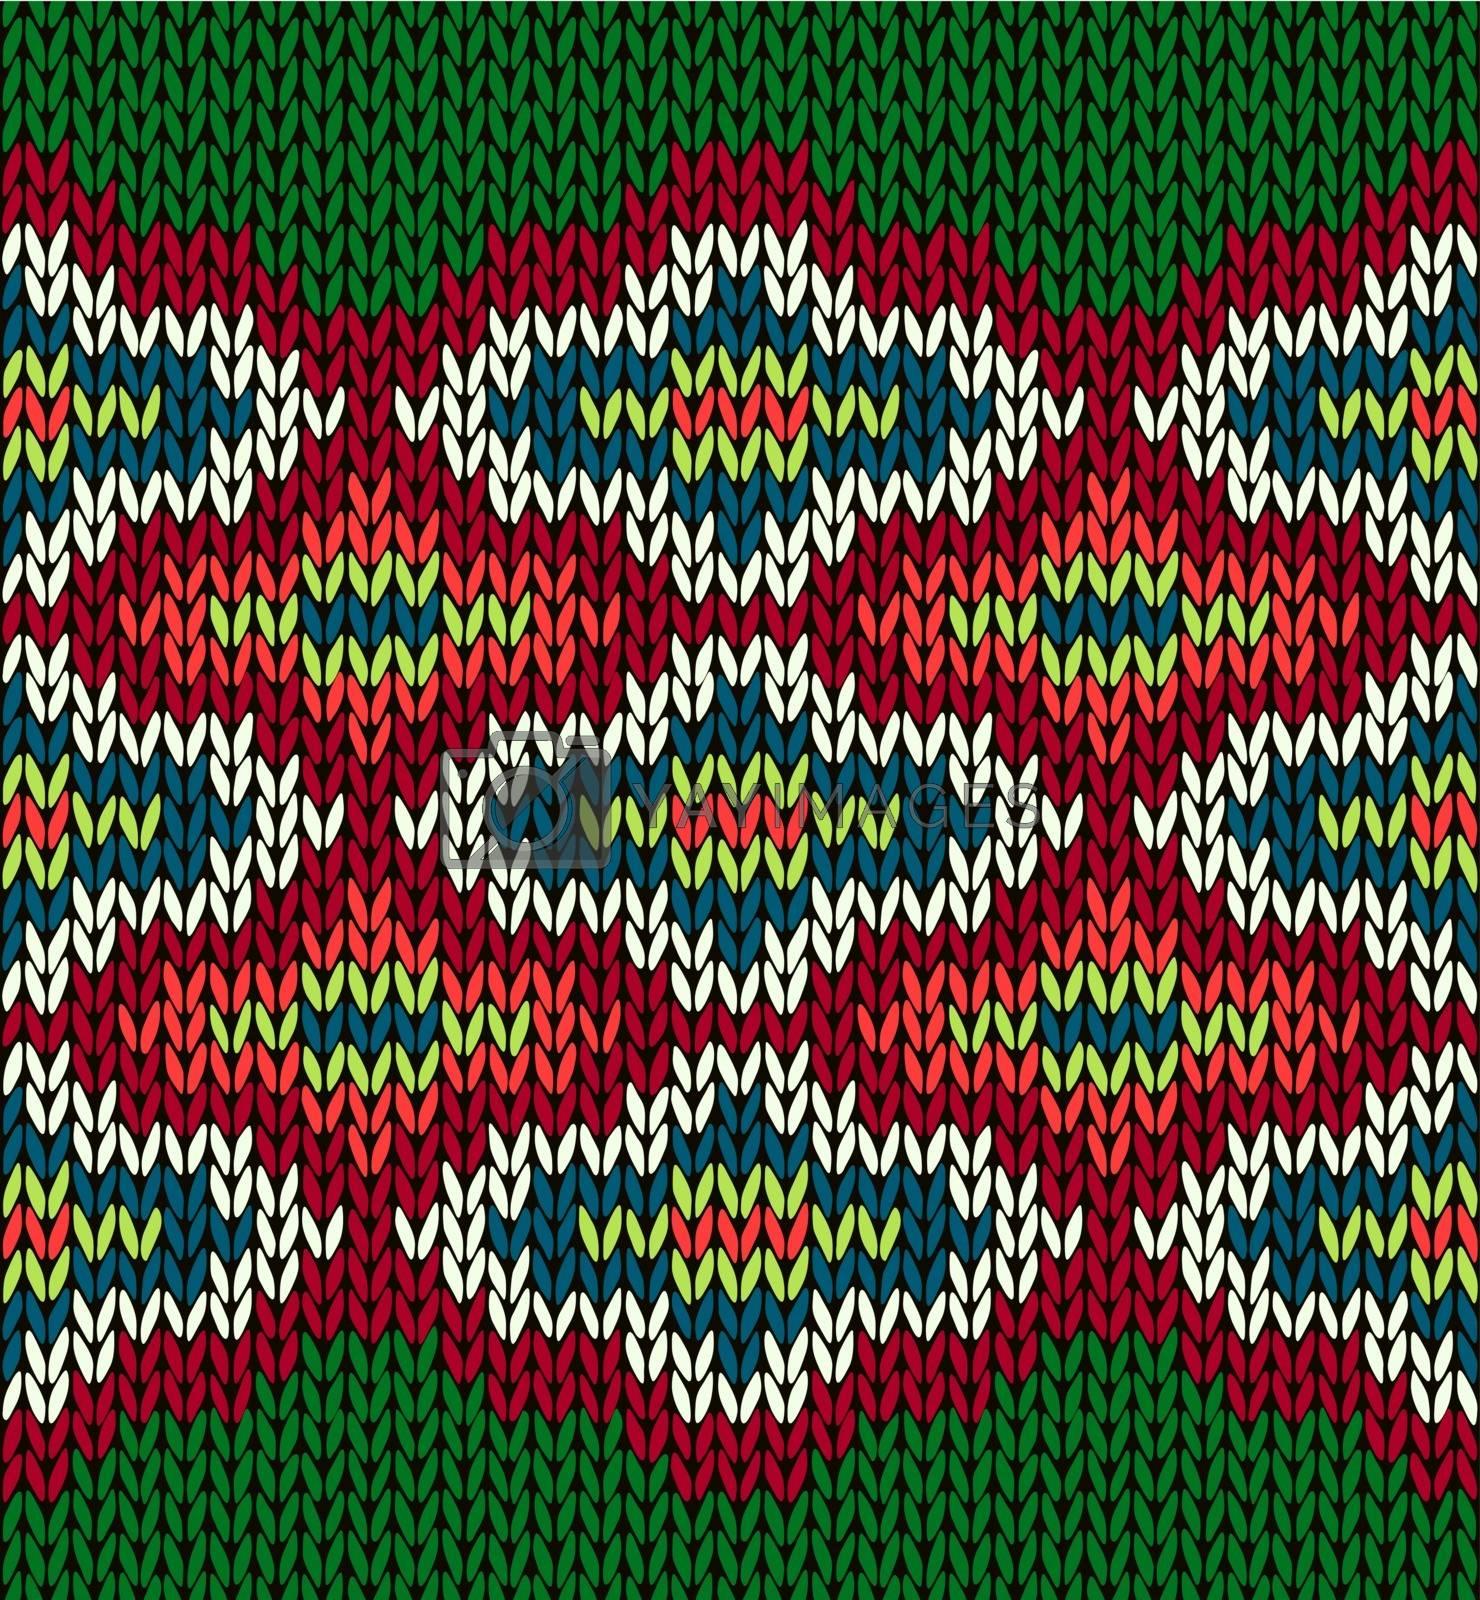 Knit Seamless Jacquard Ornament Pattern by ESSL